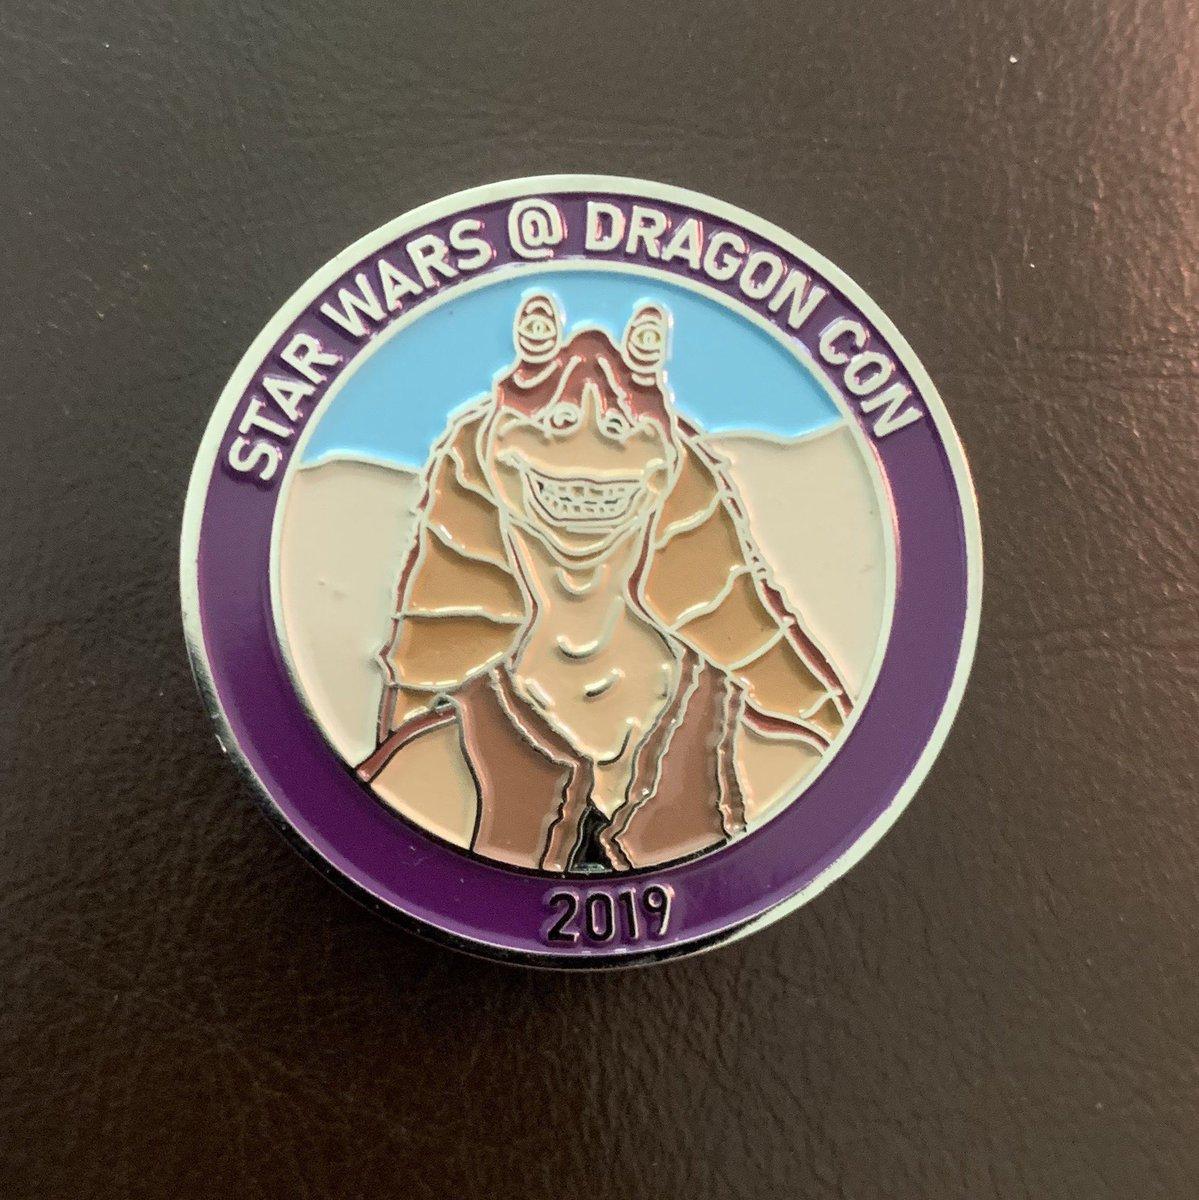 Star Wars @ Dragon Con on Twitter: